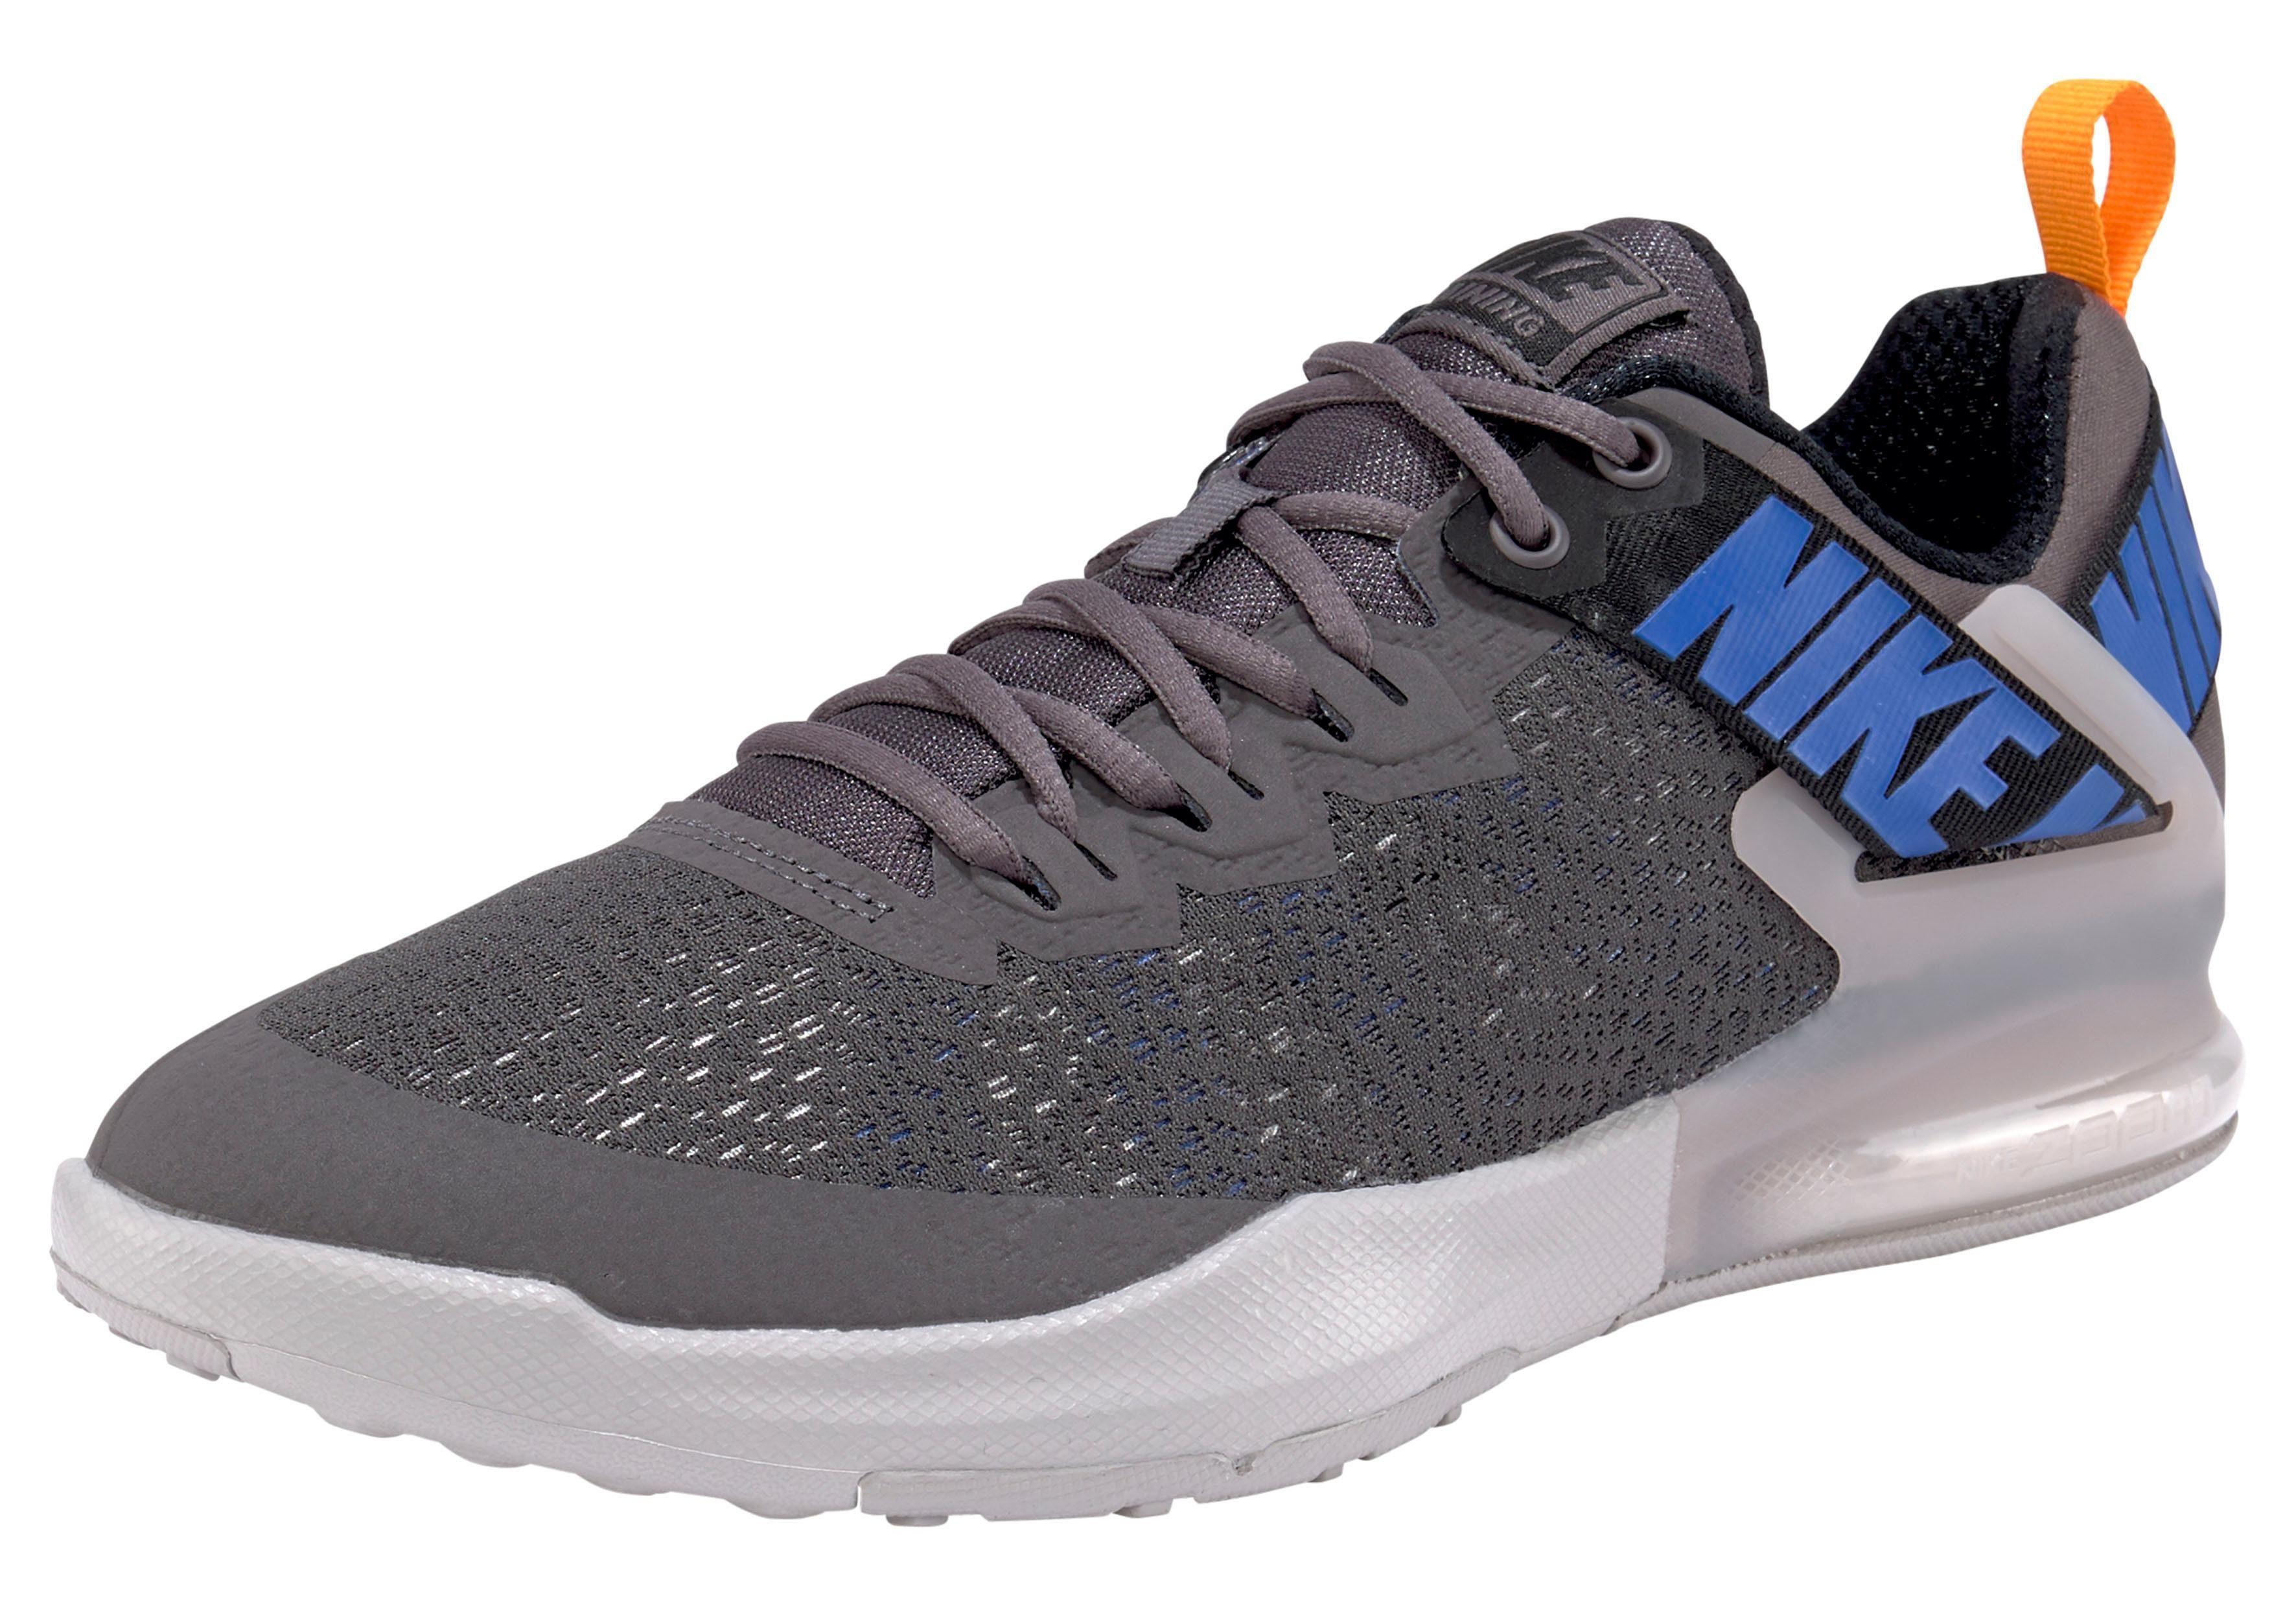 Nike »Zoom Domination Tr 2« Trainingsschuh kaufen | OTTO